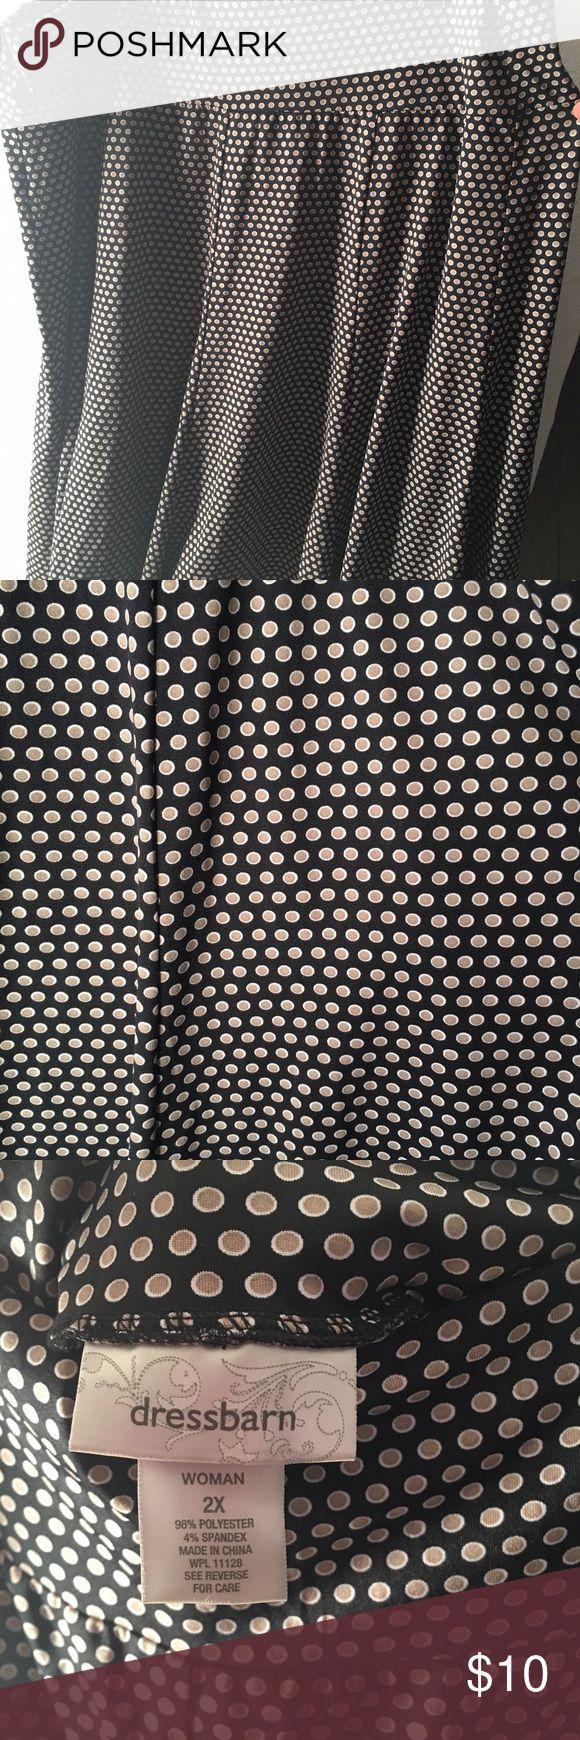 Tan & Black polka dot skirt Tan & Black polka dot skirt. Dress Barn Skirts Midi